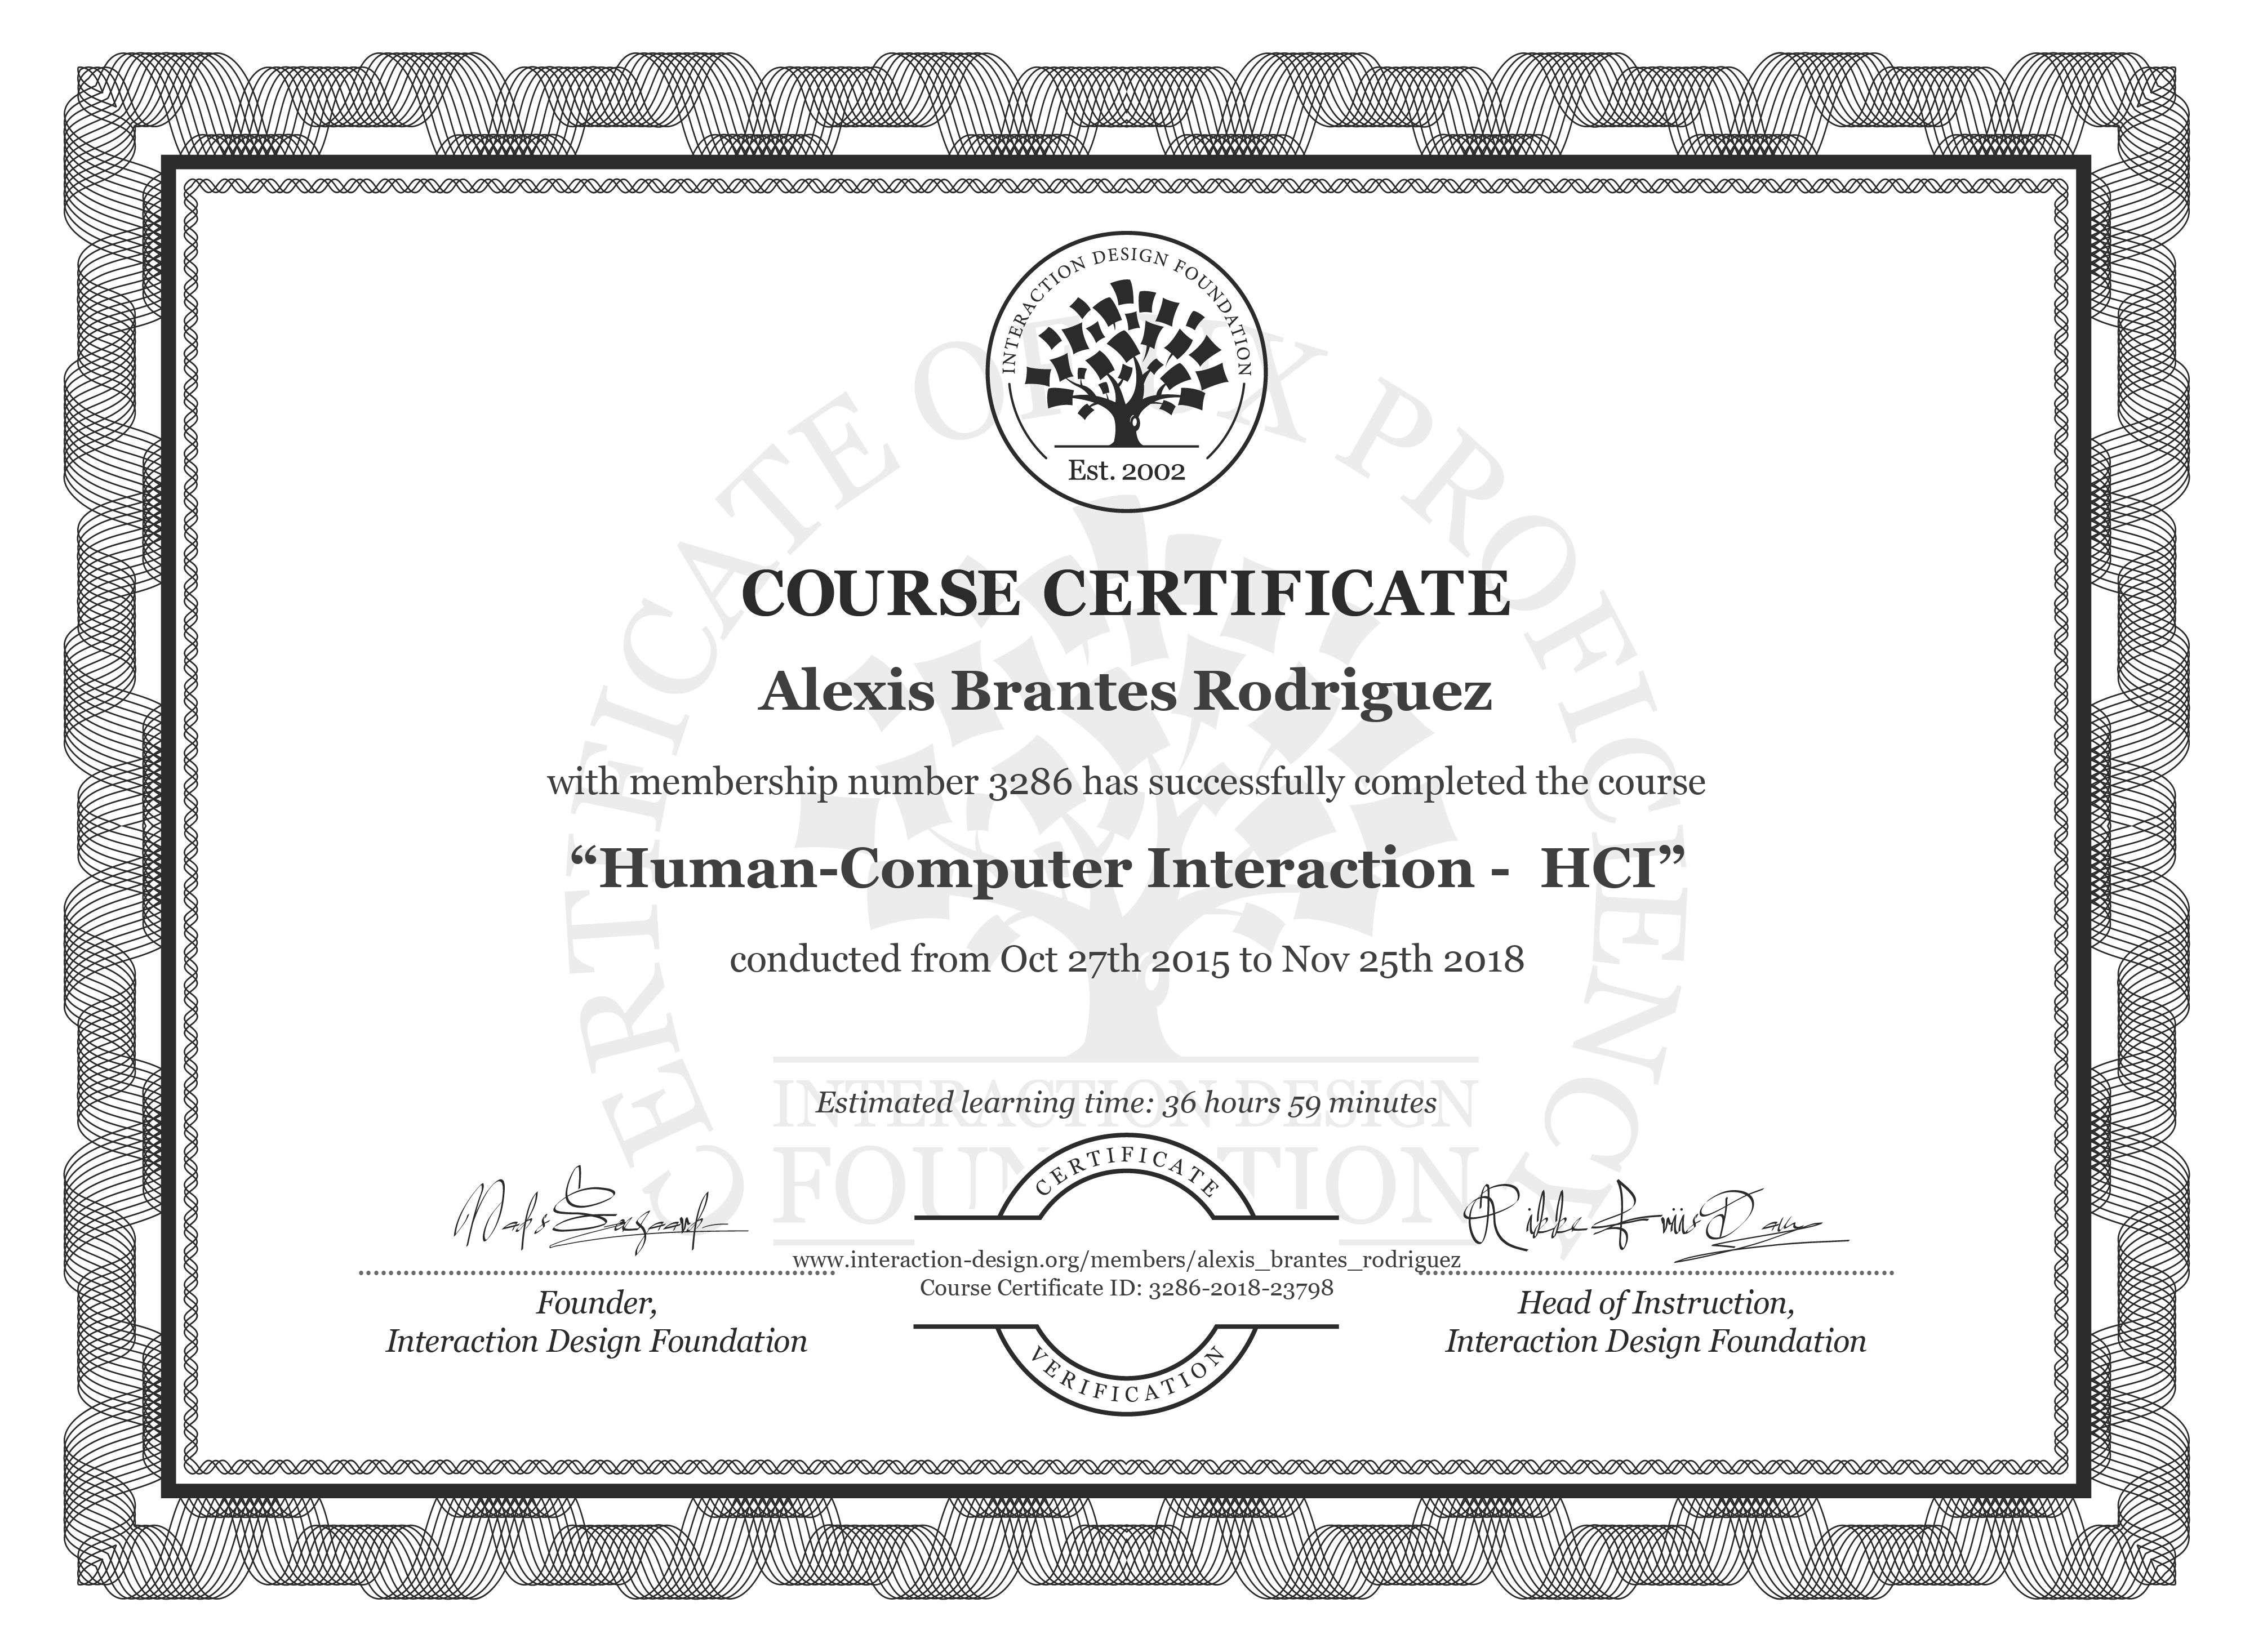 Alexis Brantes Rodriguez: Course Certificate - Human-Computer Interaction -  HCI